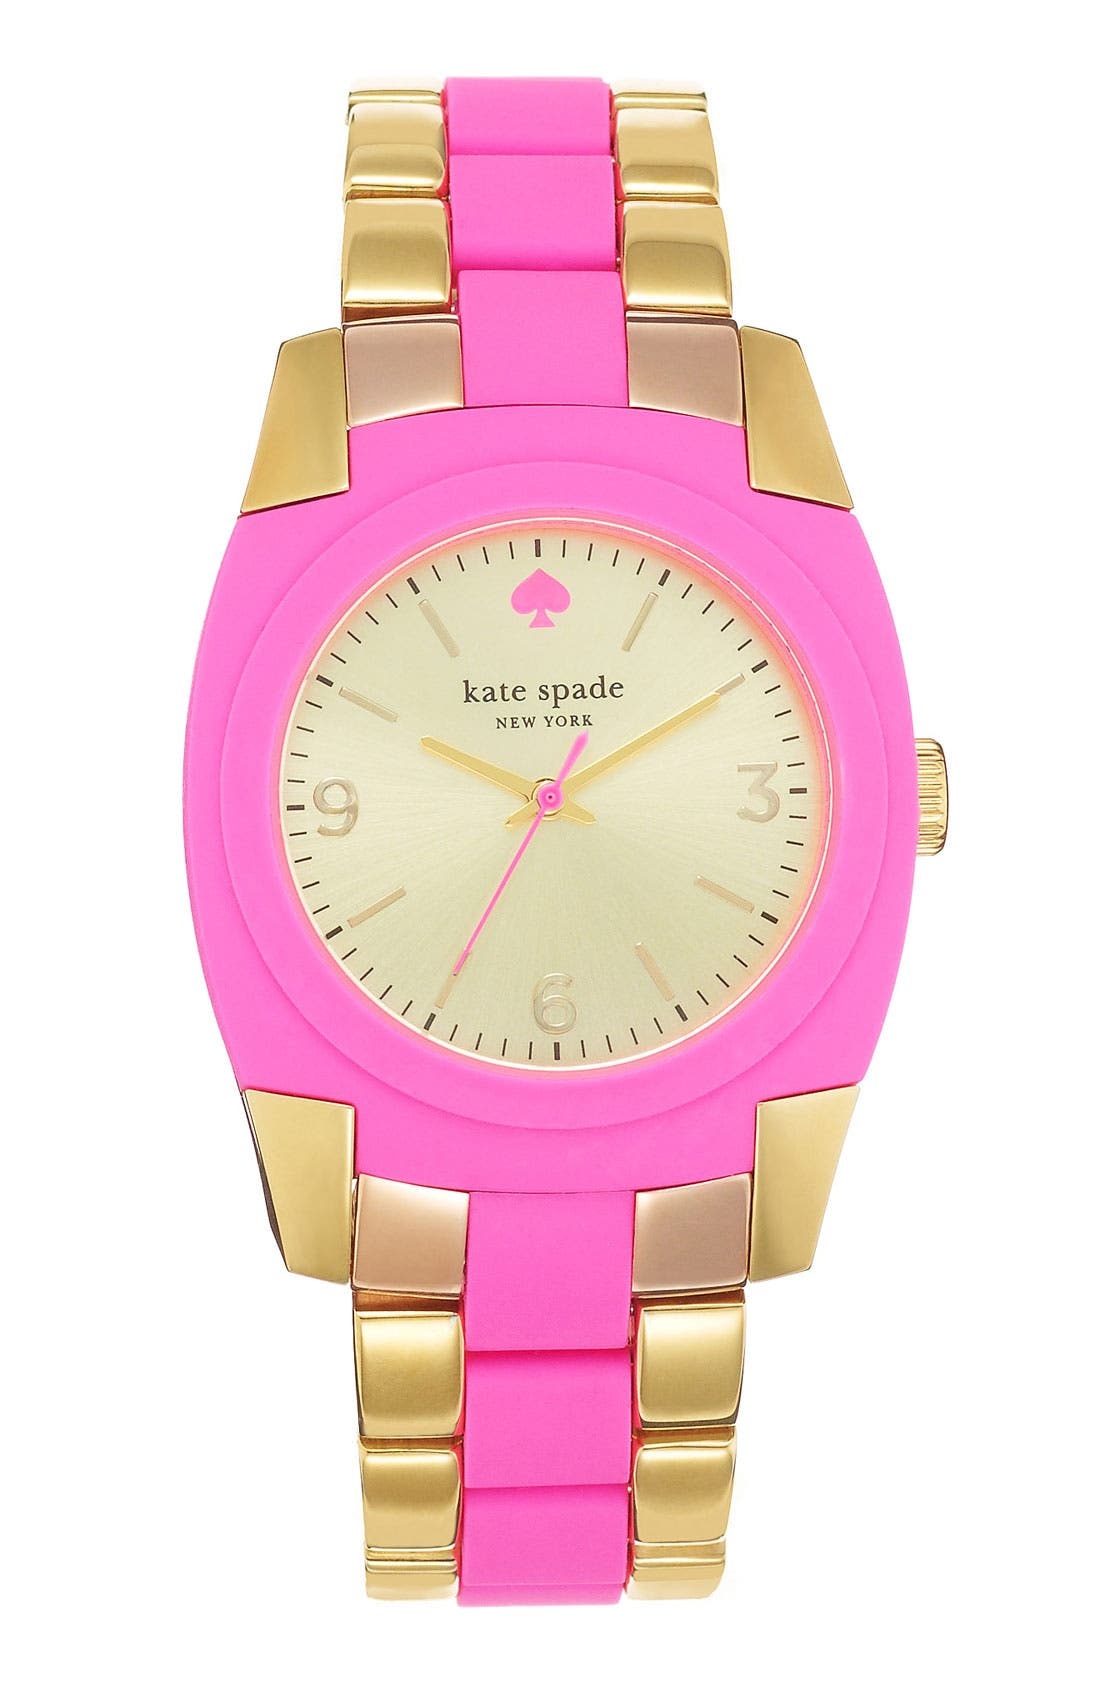 Main Image - kate spade new york 'skyline' bracelet watch, 36mm (Nordstrom Exclusive)